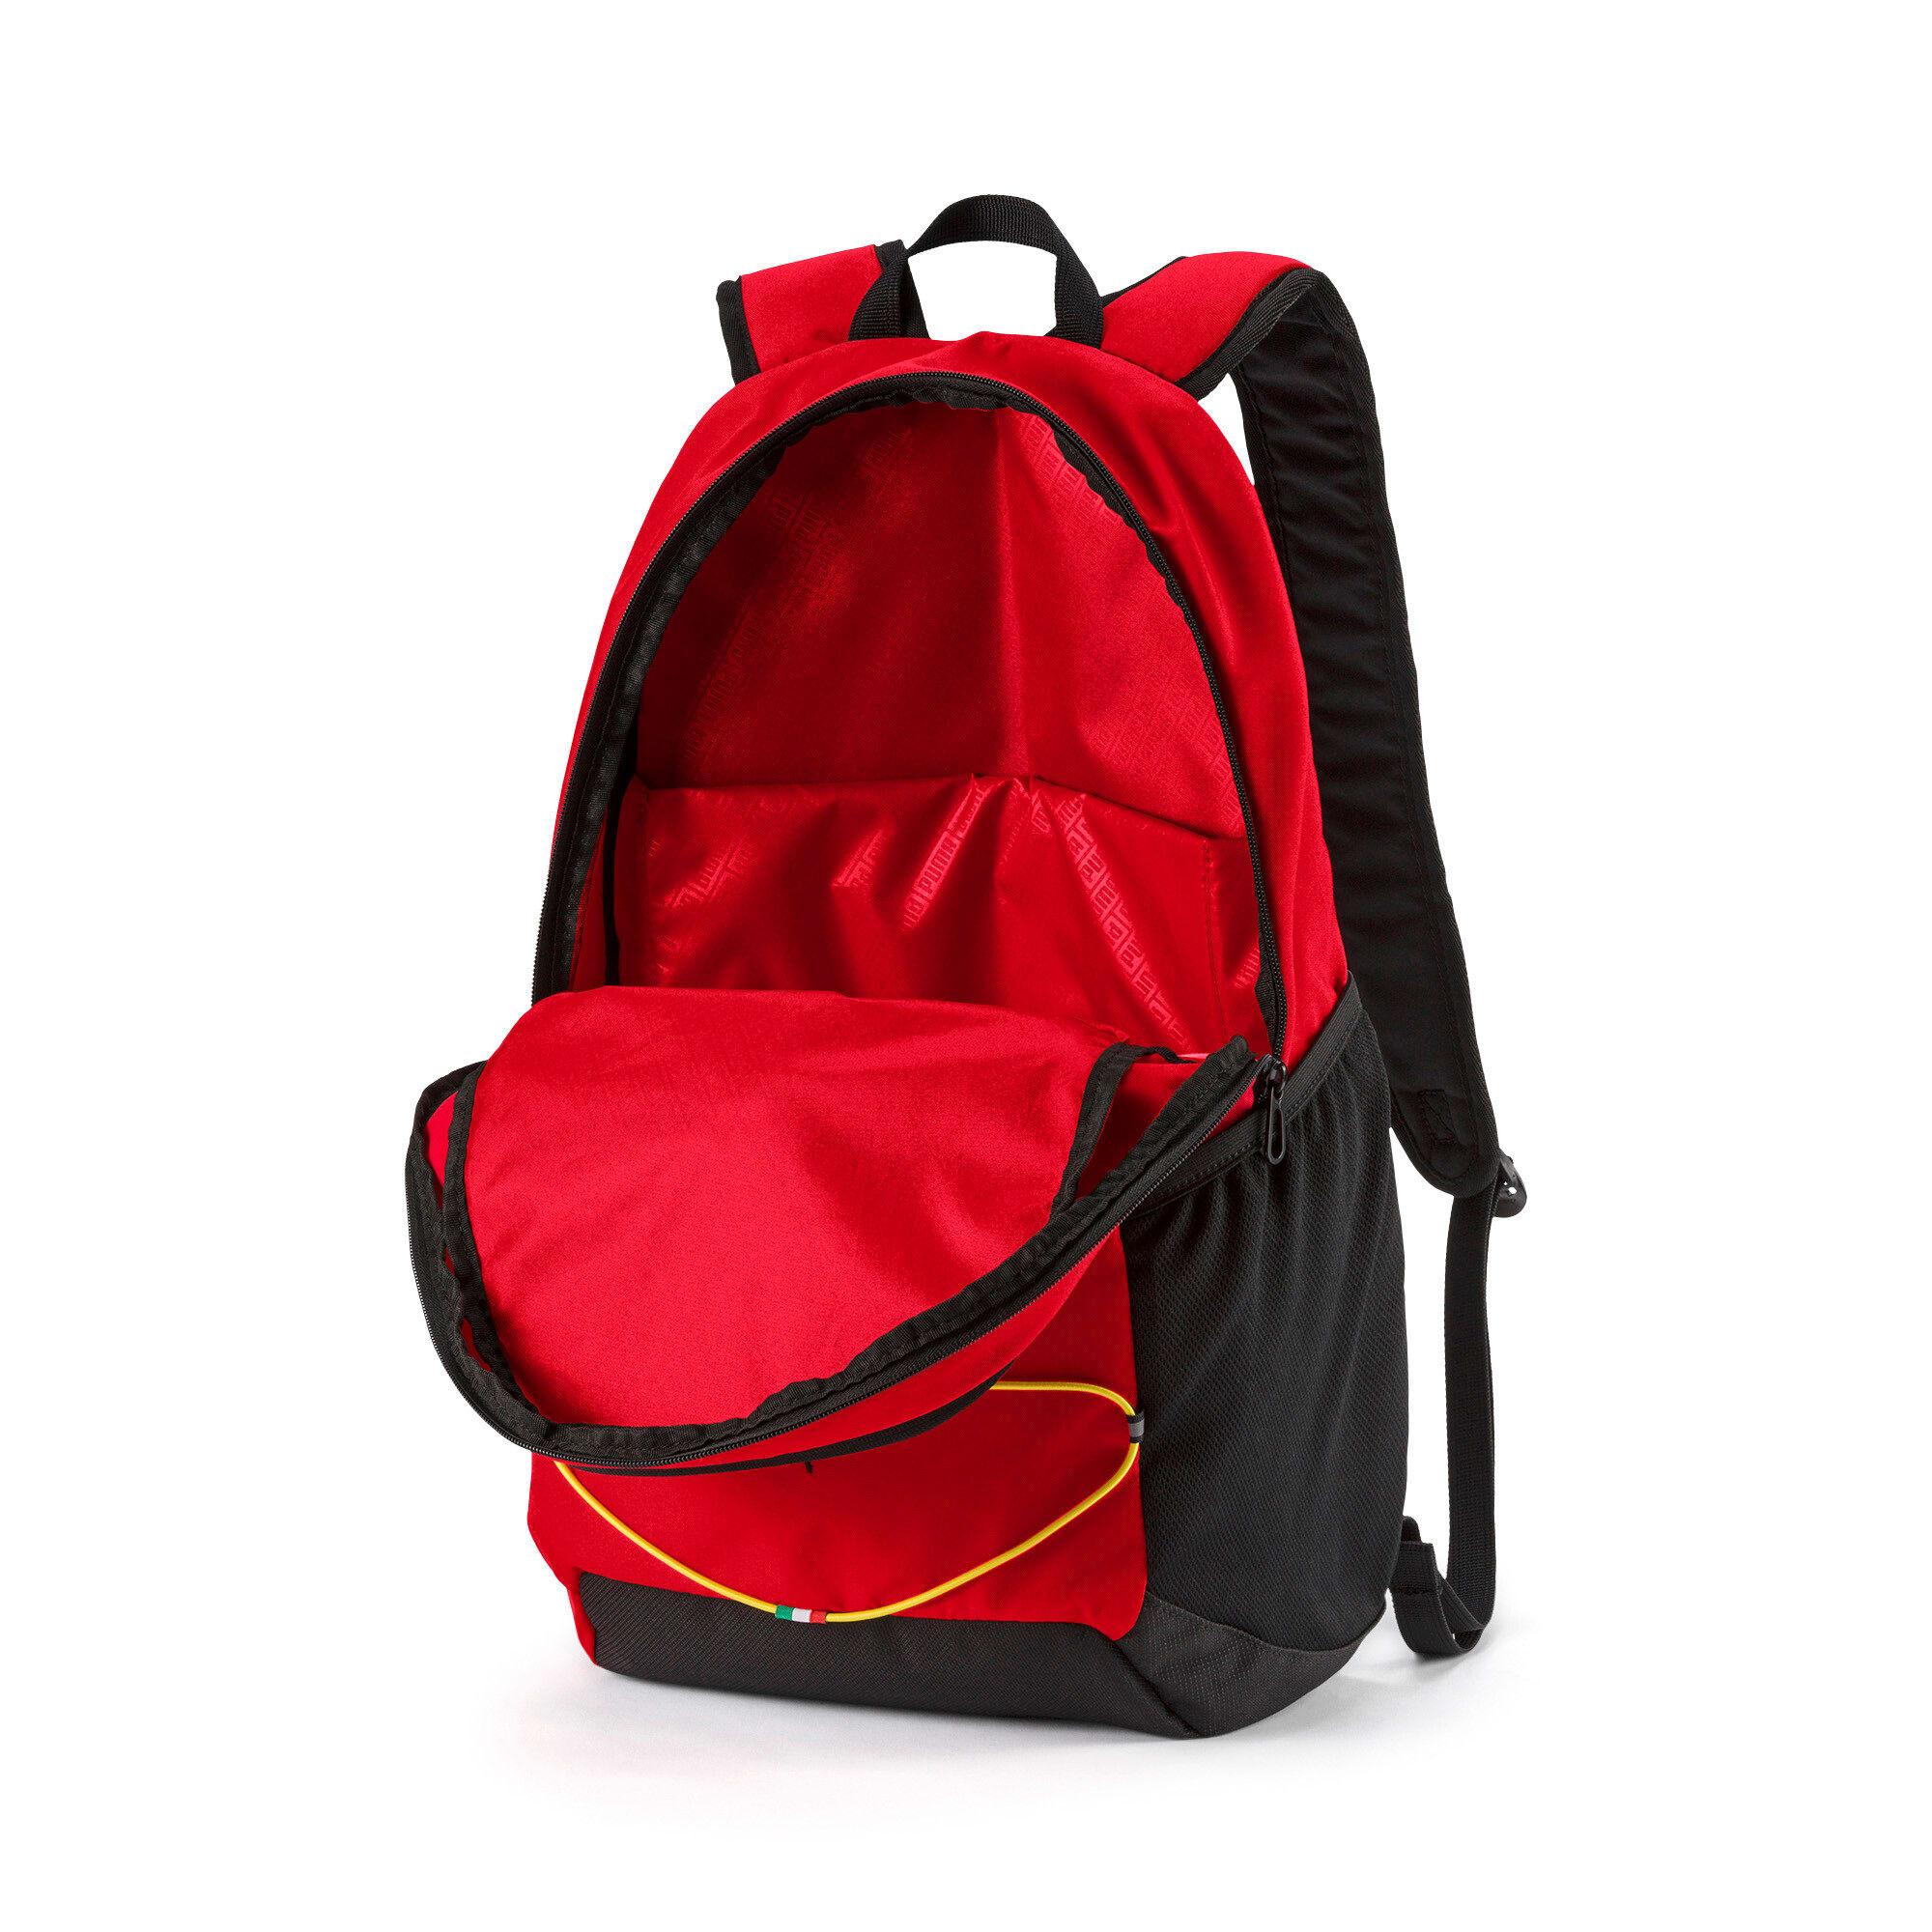 Thumbnail 3 of Ferrari Fanwear Backpack, Rosso Corsa, medium-IND